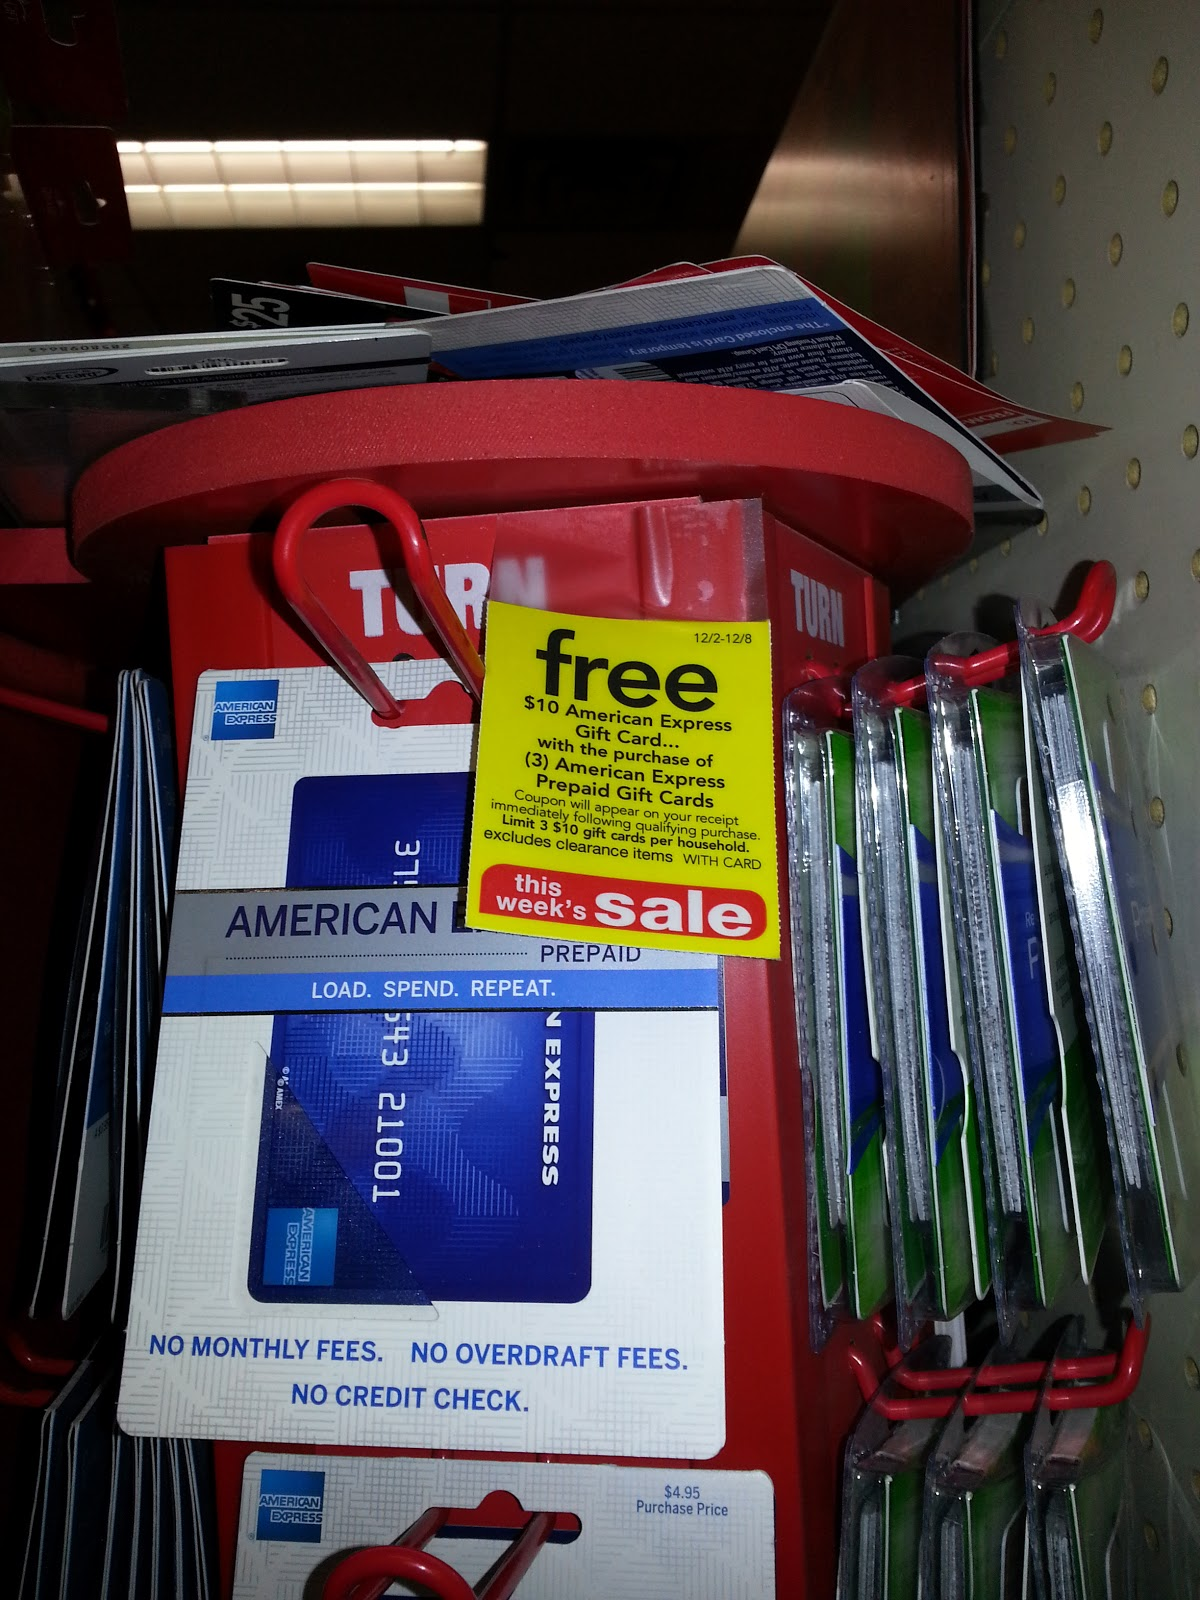 american express - Cvs Prepaid Cards